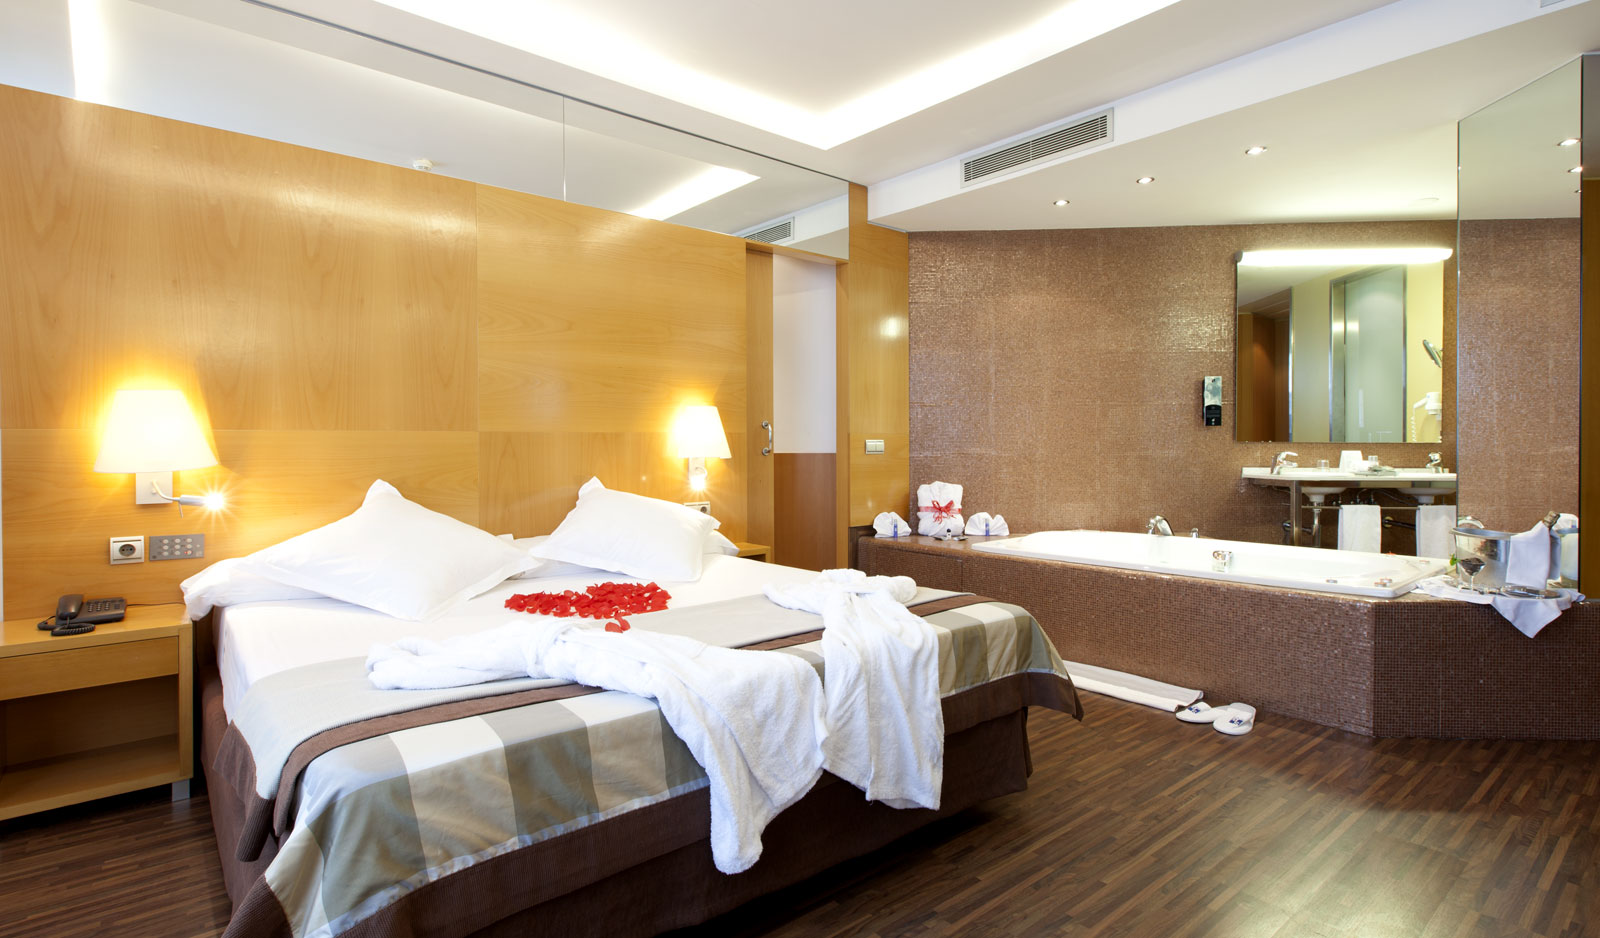 Jacuzzi suite rooms hotel sb icaria barcelona official - Jacuzzi de lujo ...